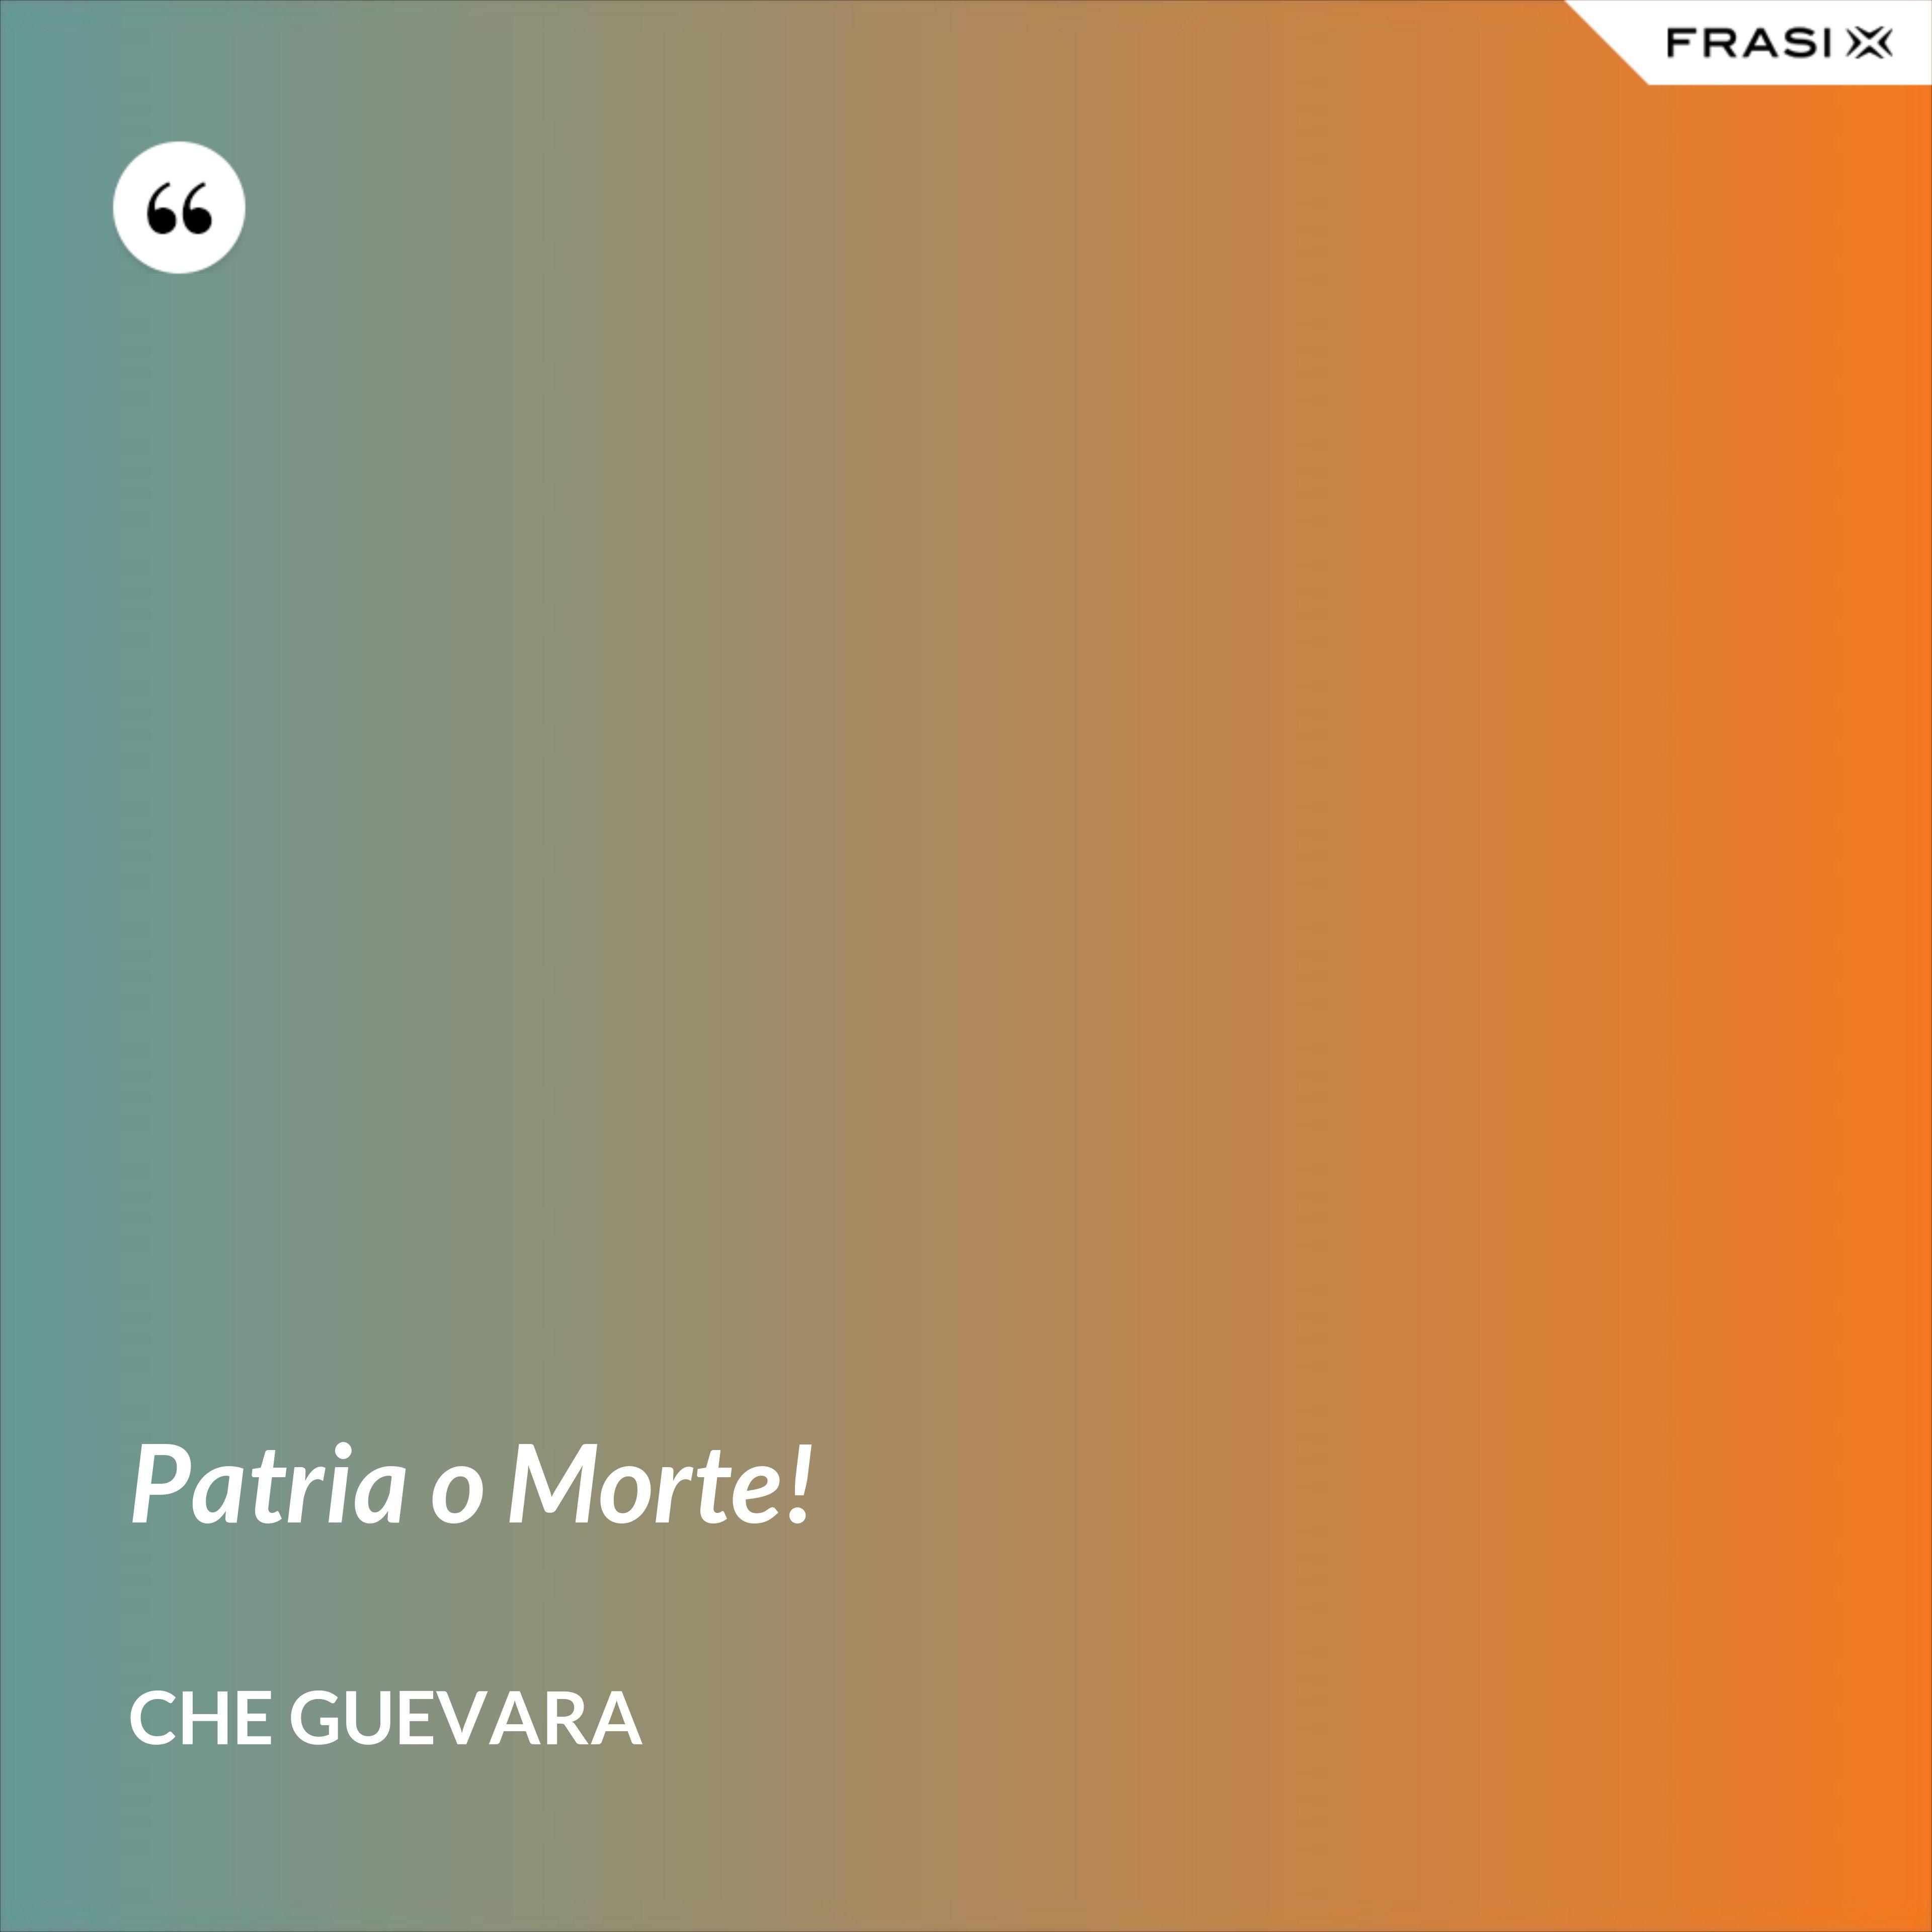 Patria o Morte! - Che Guevara